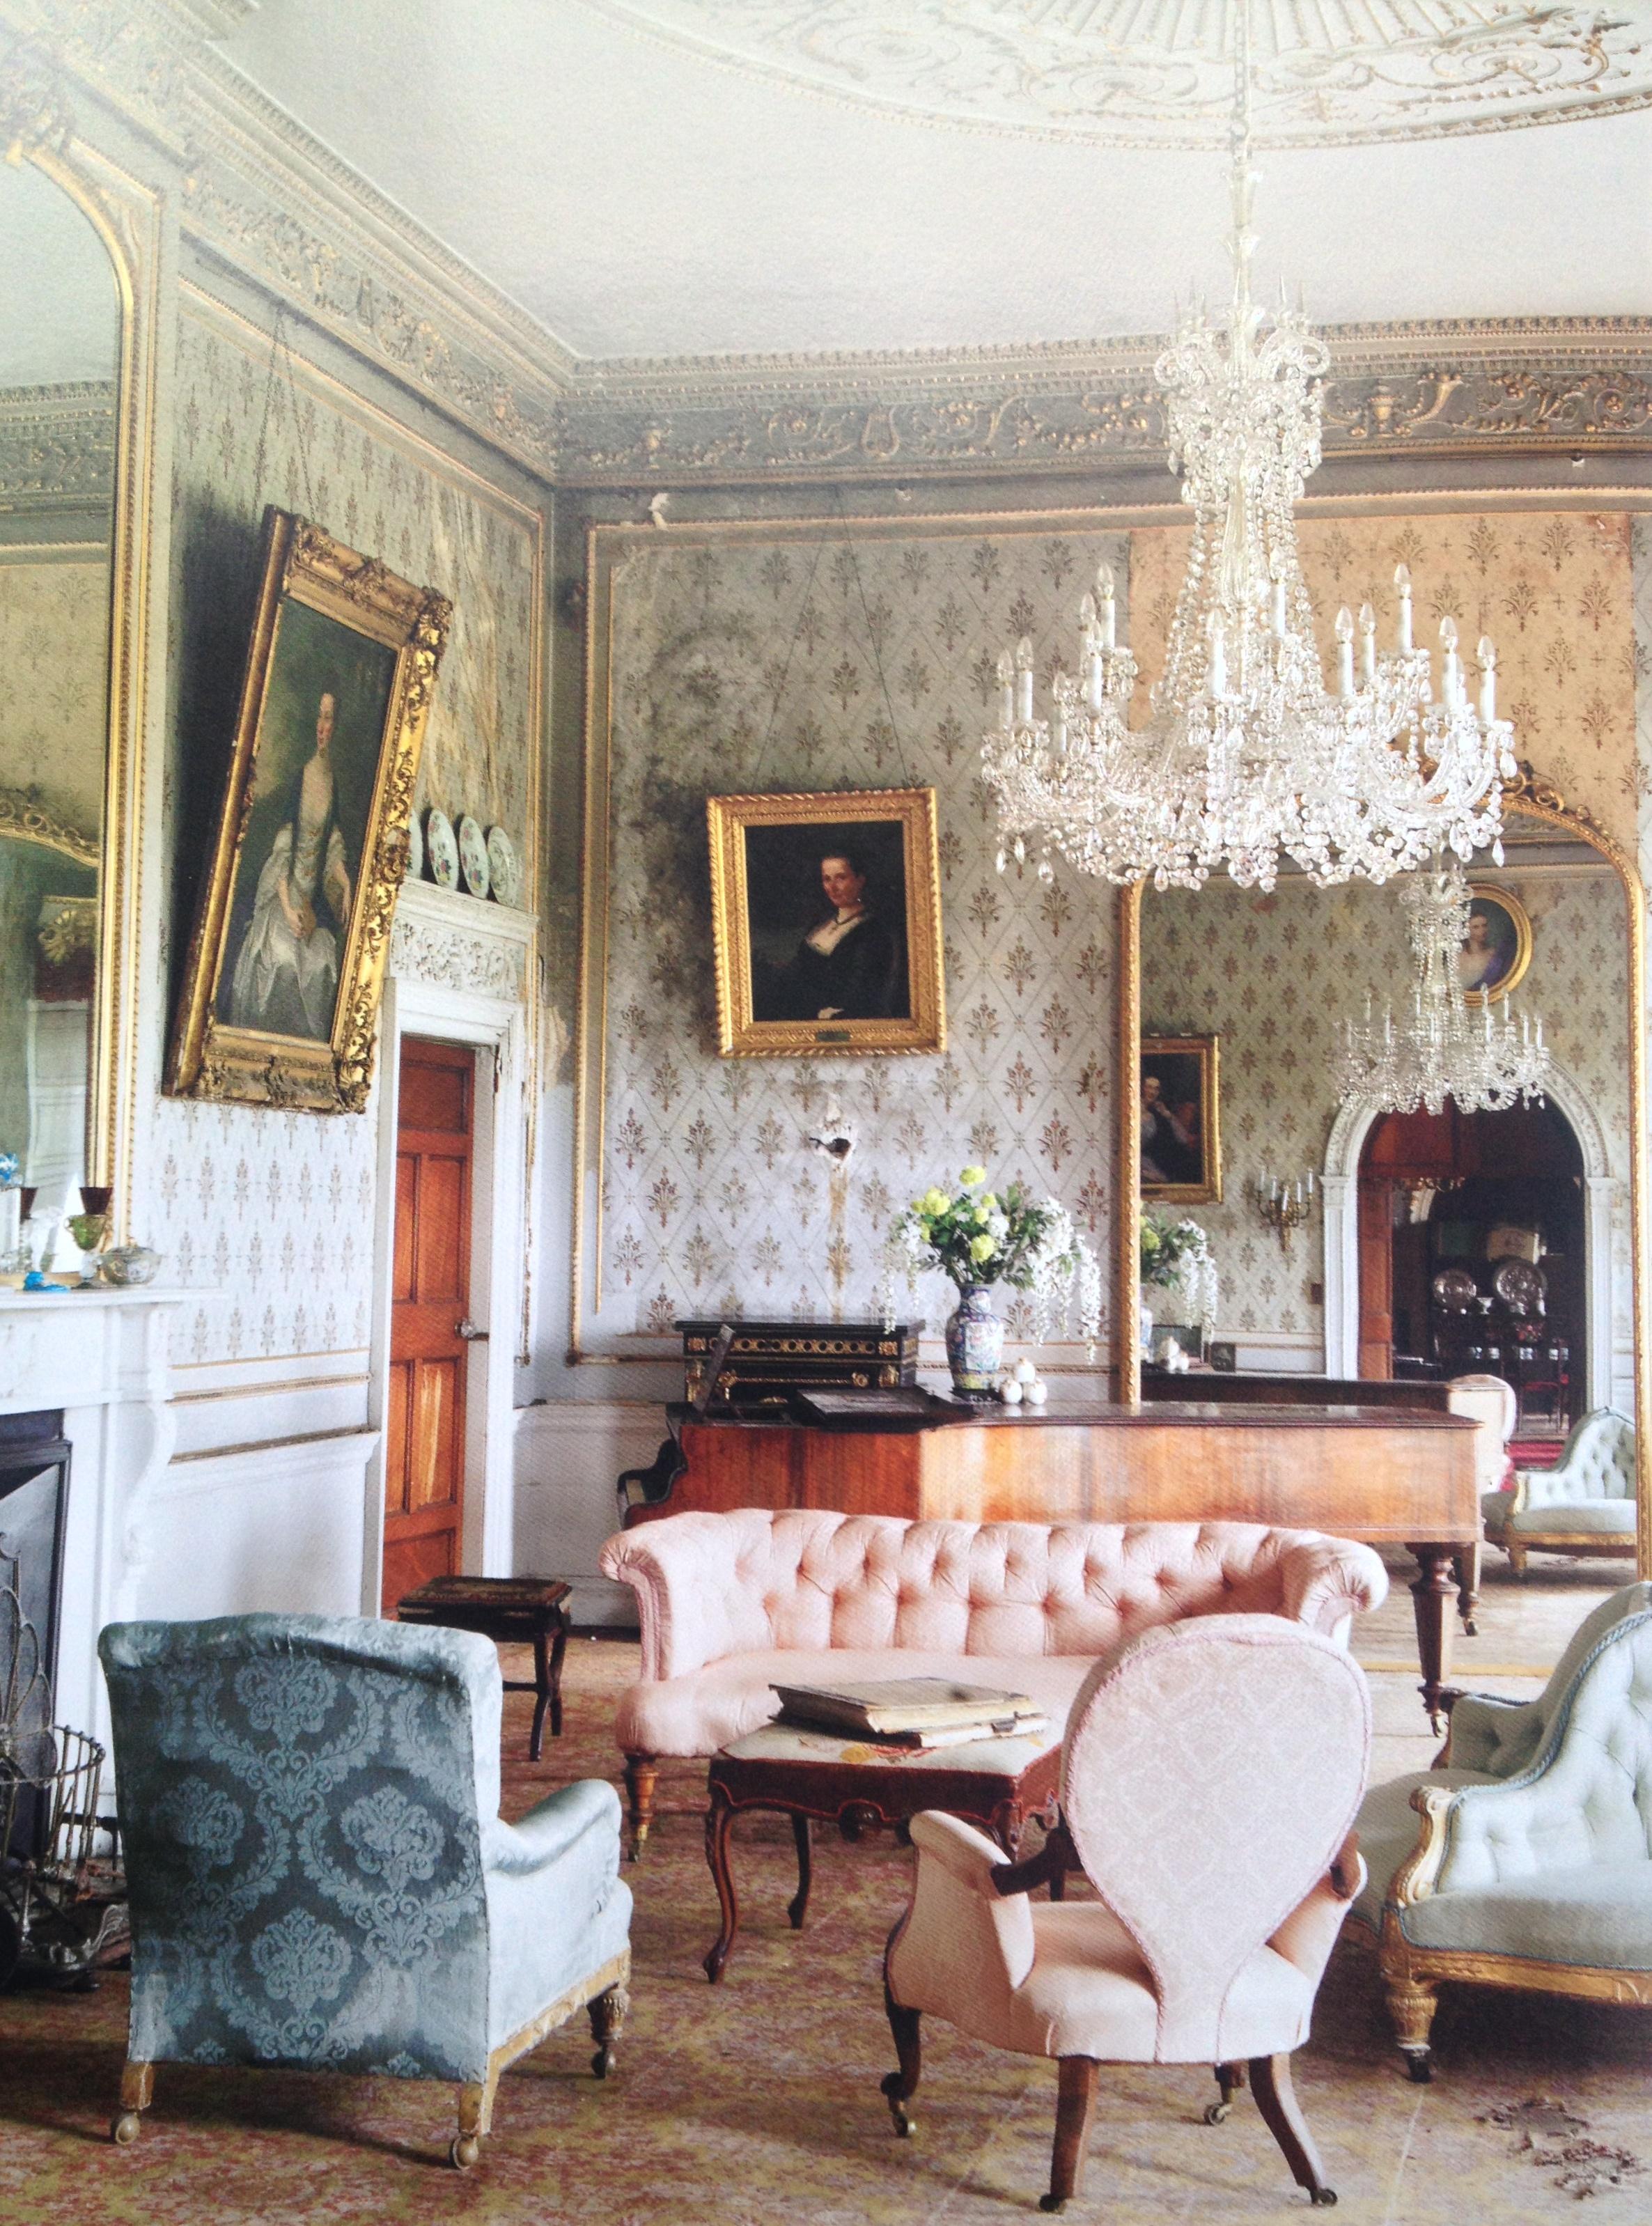 Chekhov's period house interior design and decoration